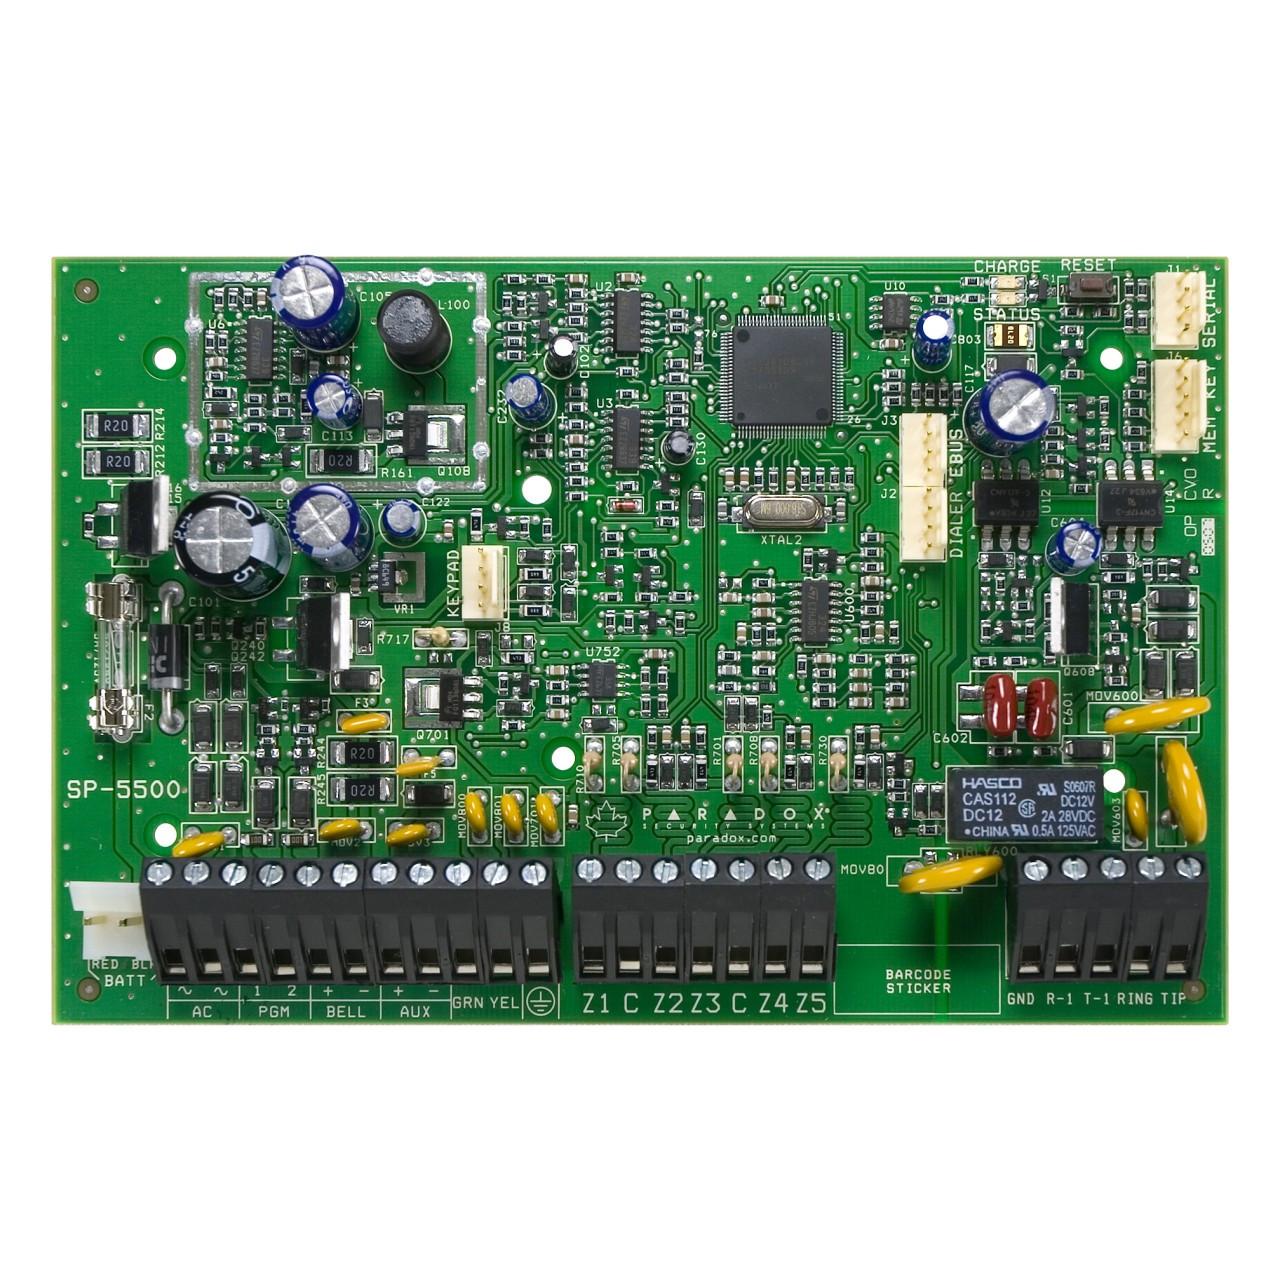 paradox sp5500 5 to 32 zone alarm panel tremtech electrical rh store tremtech com paradox spectra sp5500 installation manual paradox sp5500 programming guide